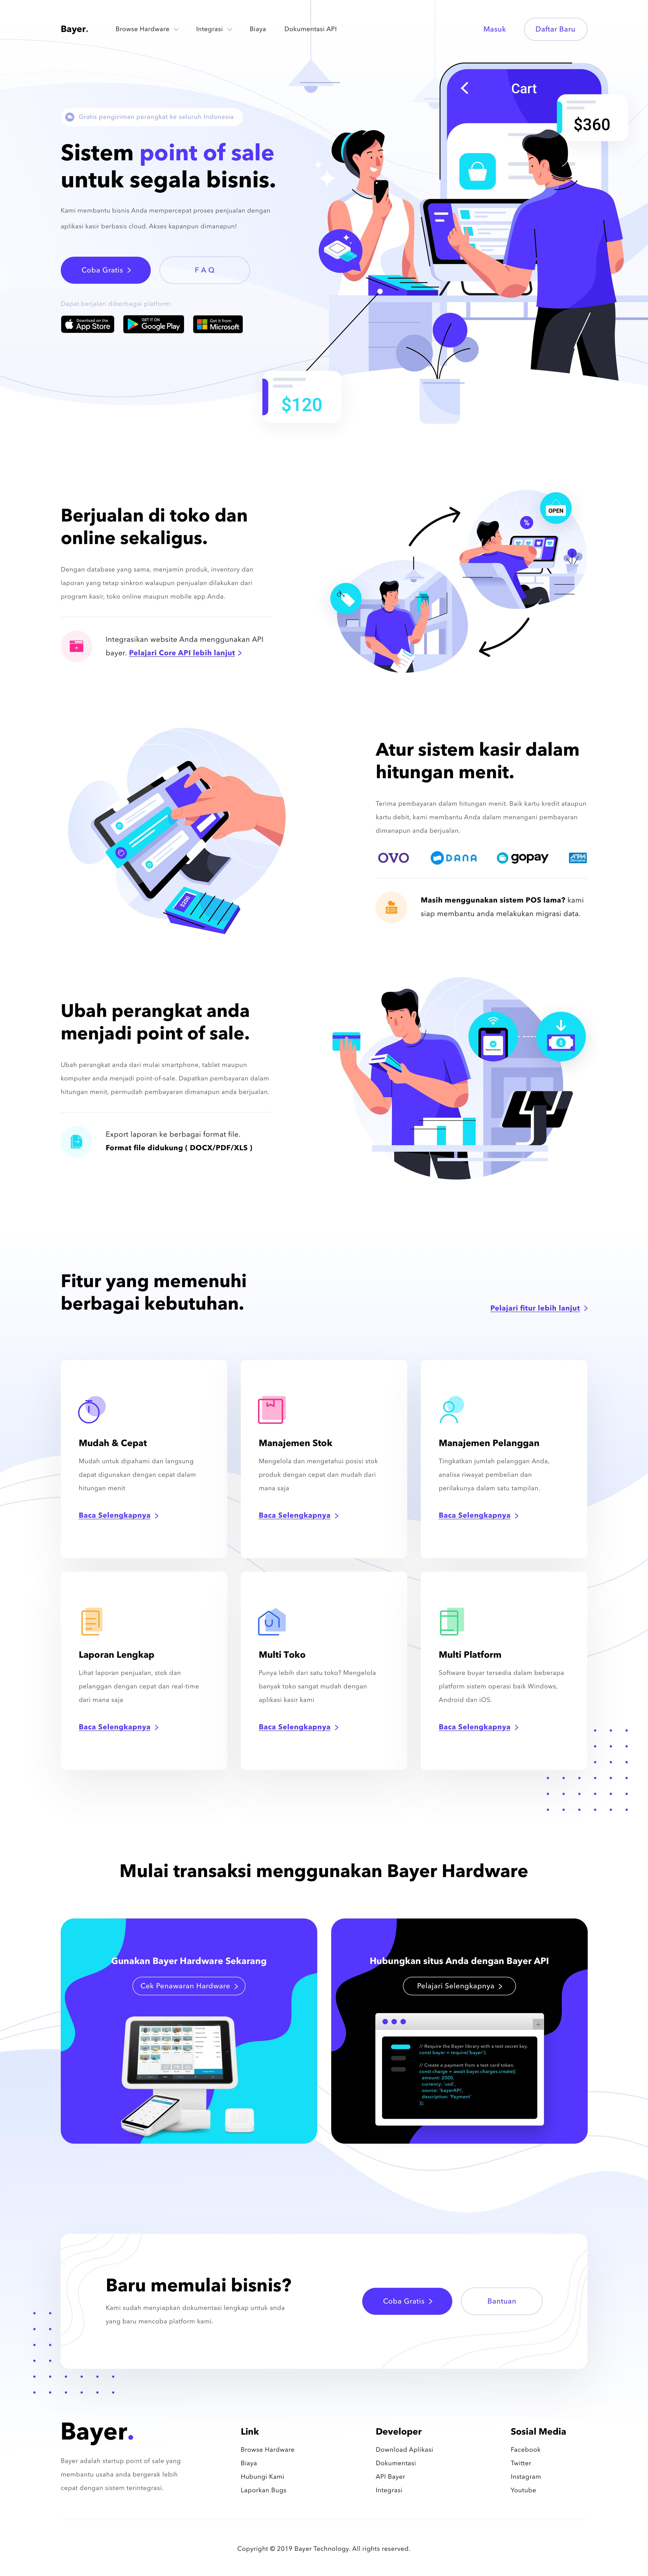 User Interface Design Inspiration Graphic Design Inspiration